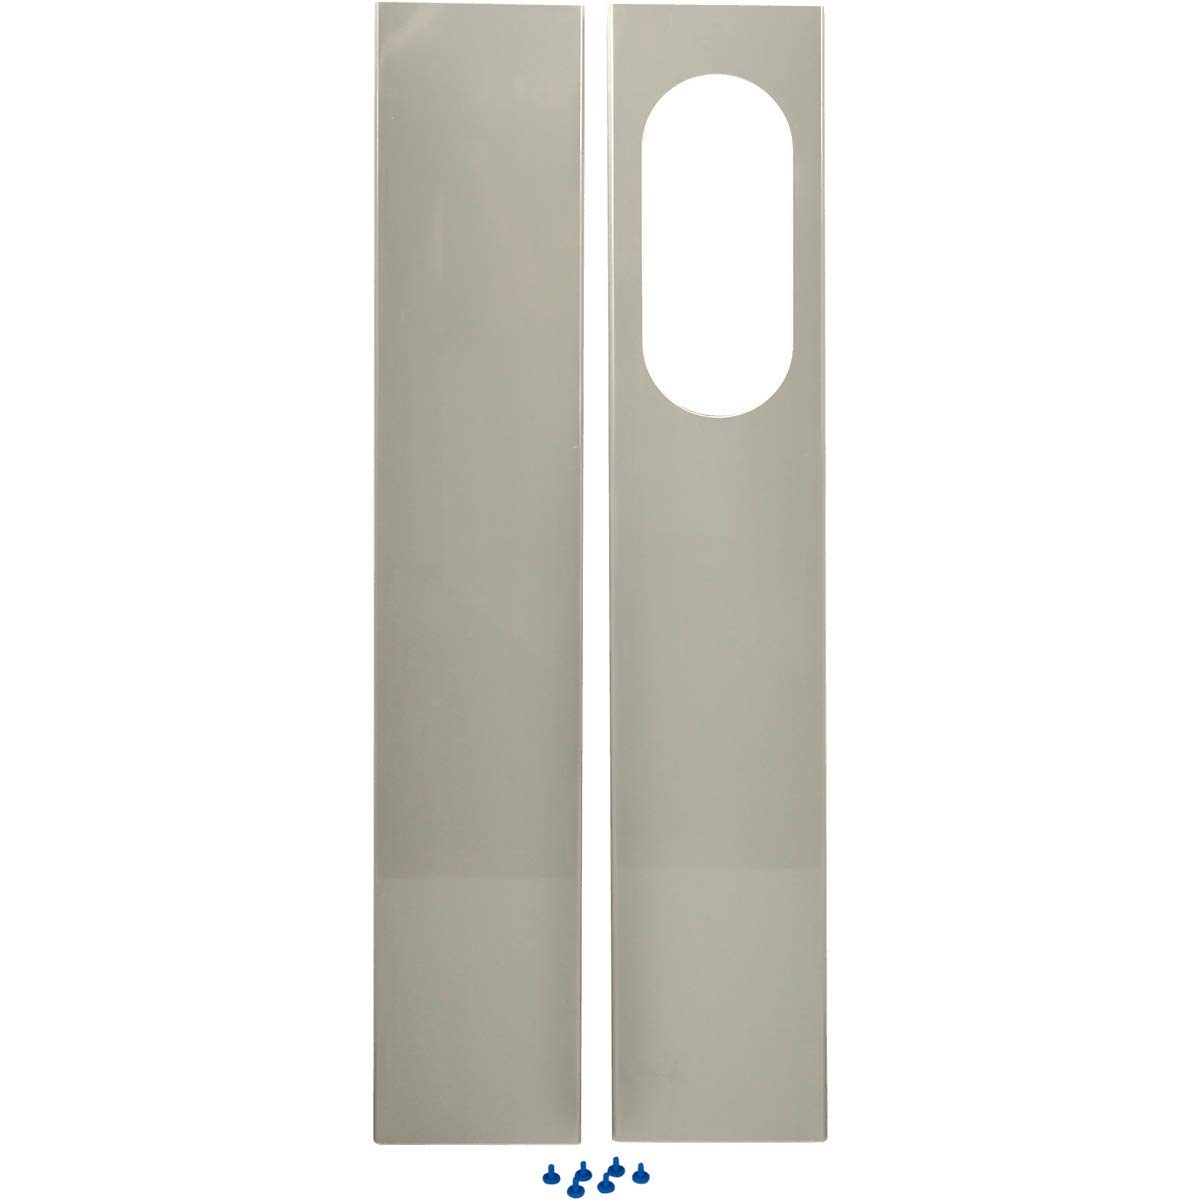 Honeywell HL-Series Portable AC 2-Piece Window Kit